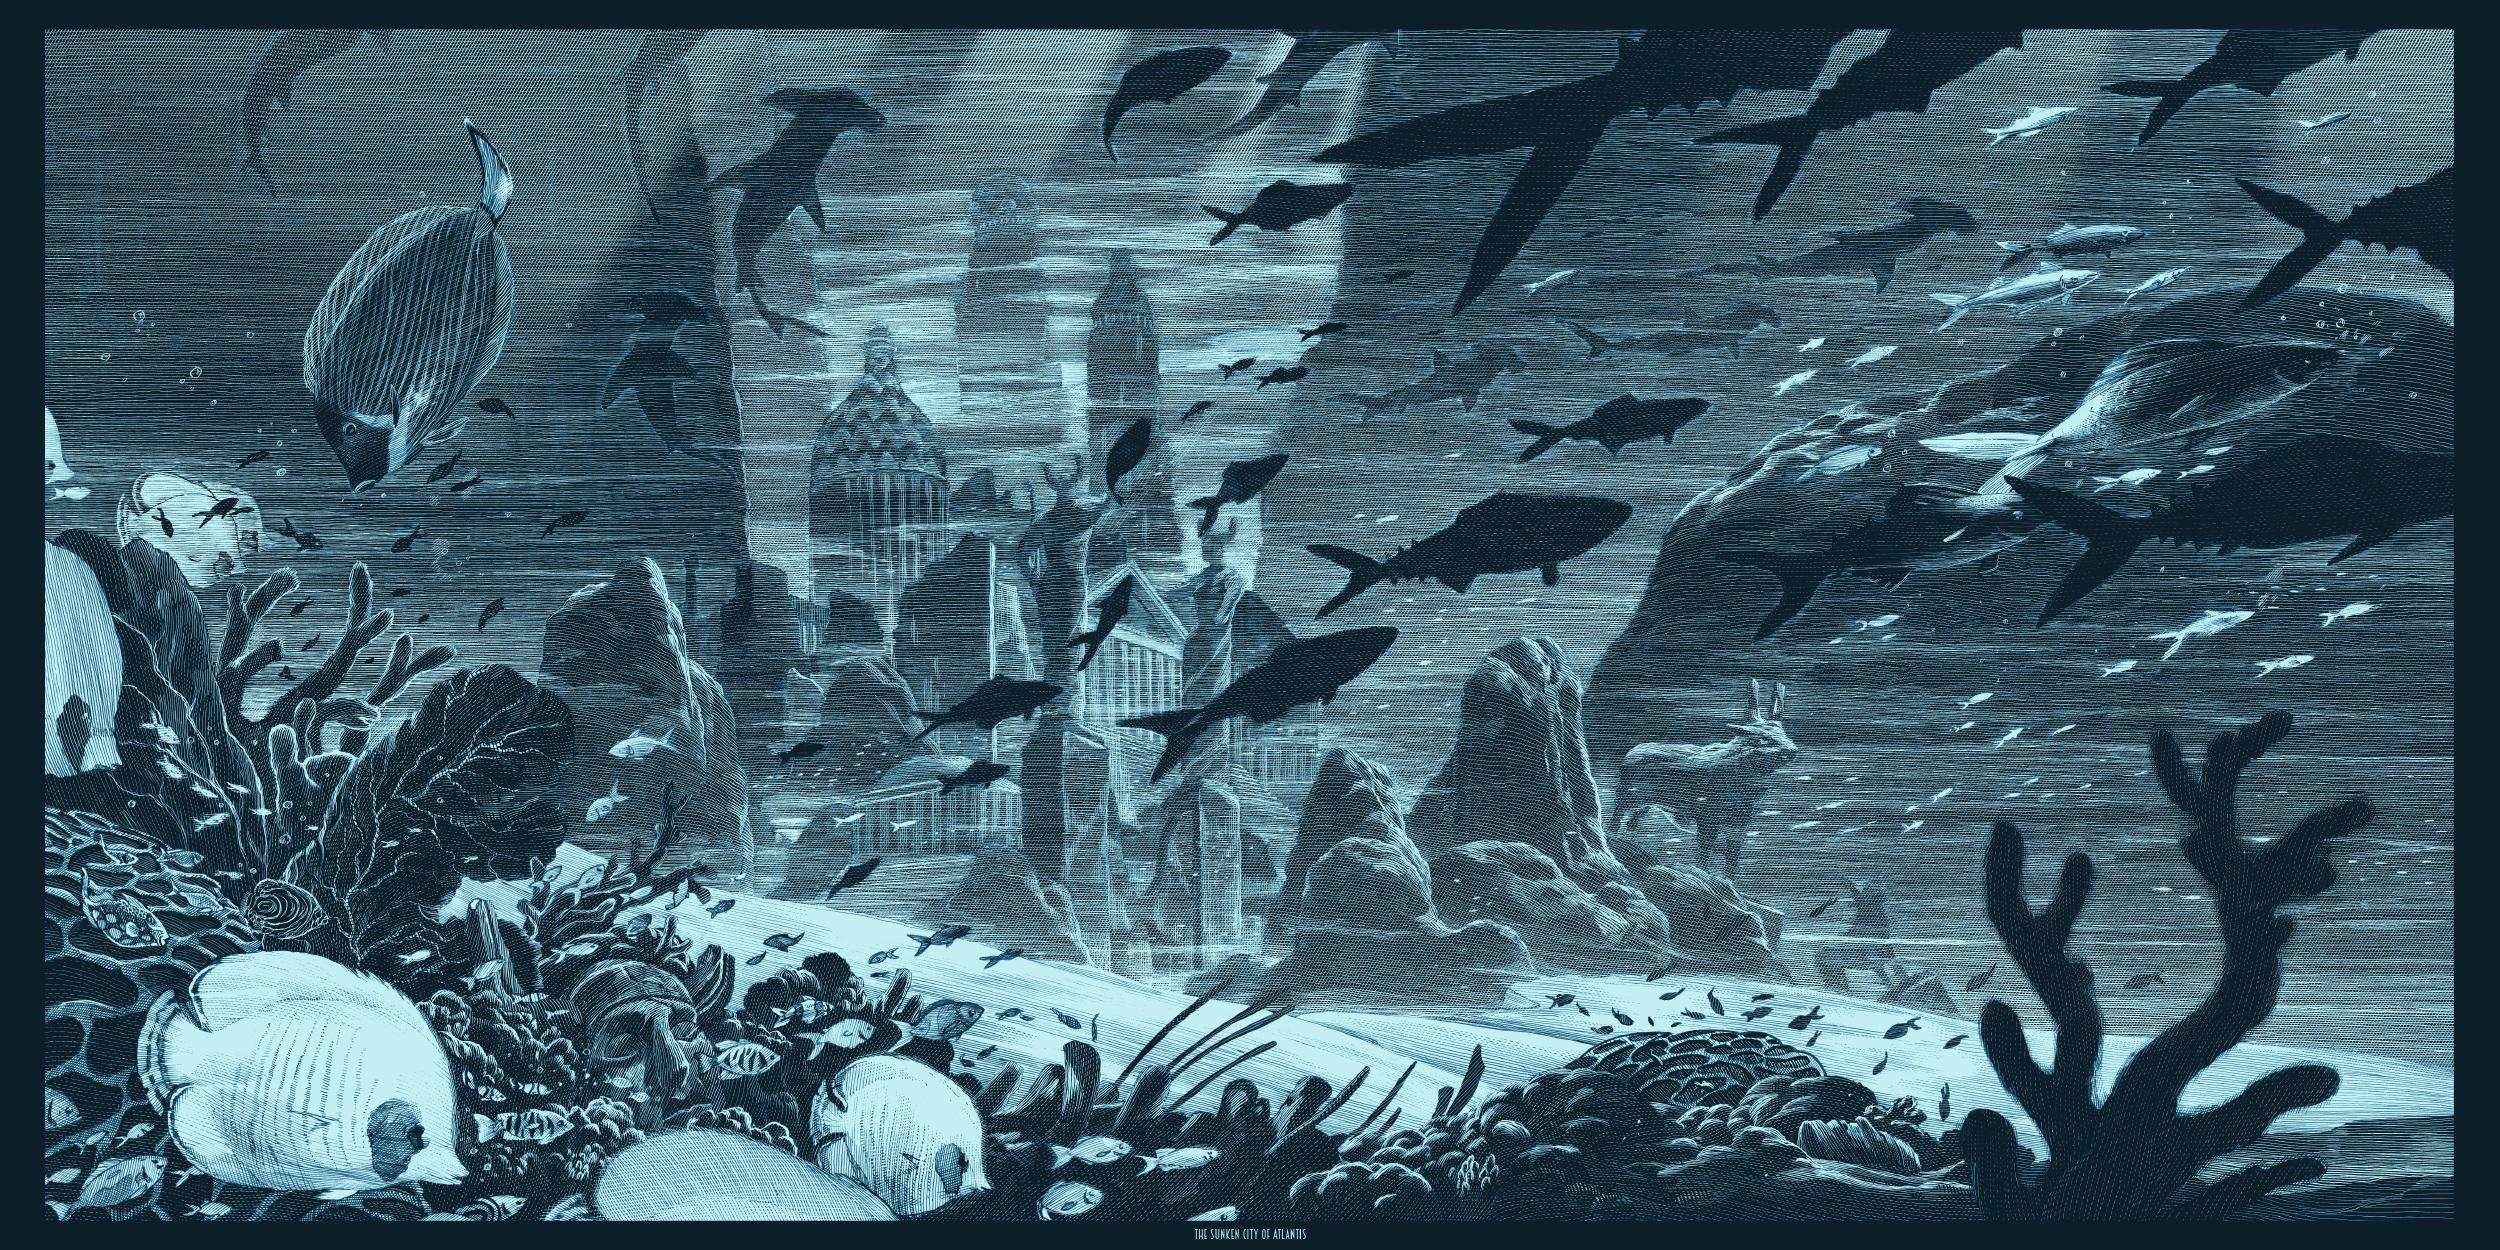 """Atlantis"" by Nicolas Delort.  12"" x 24"" Screenprint w/ metallics.  Ed of 30 N.  $75 (variant)"